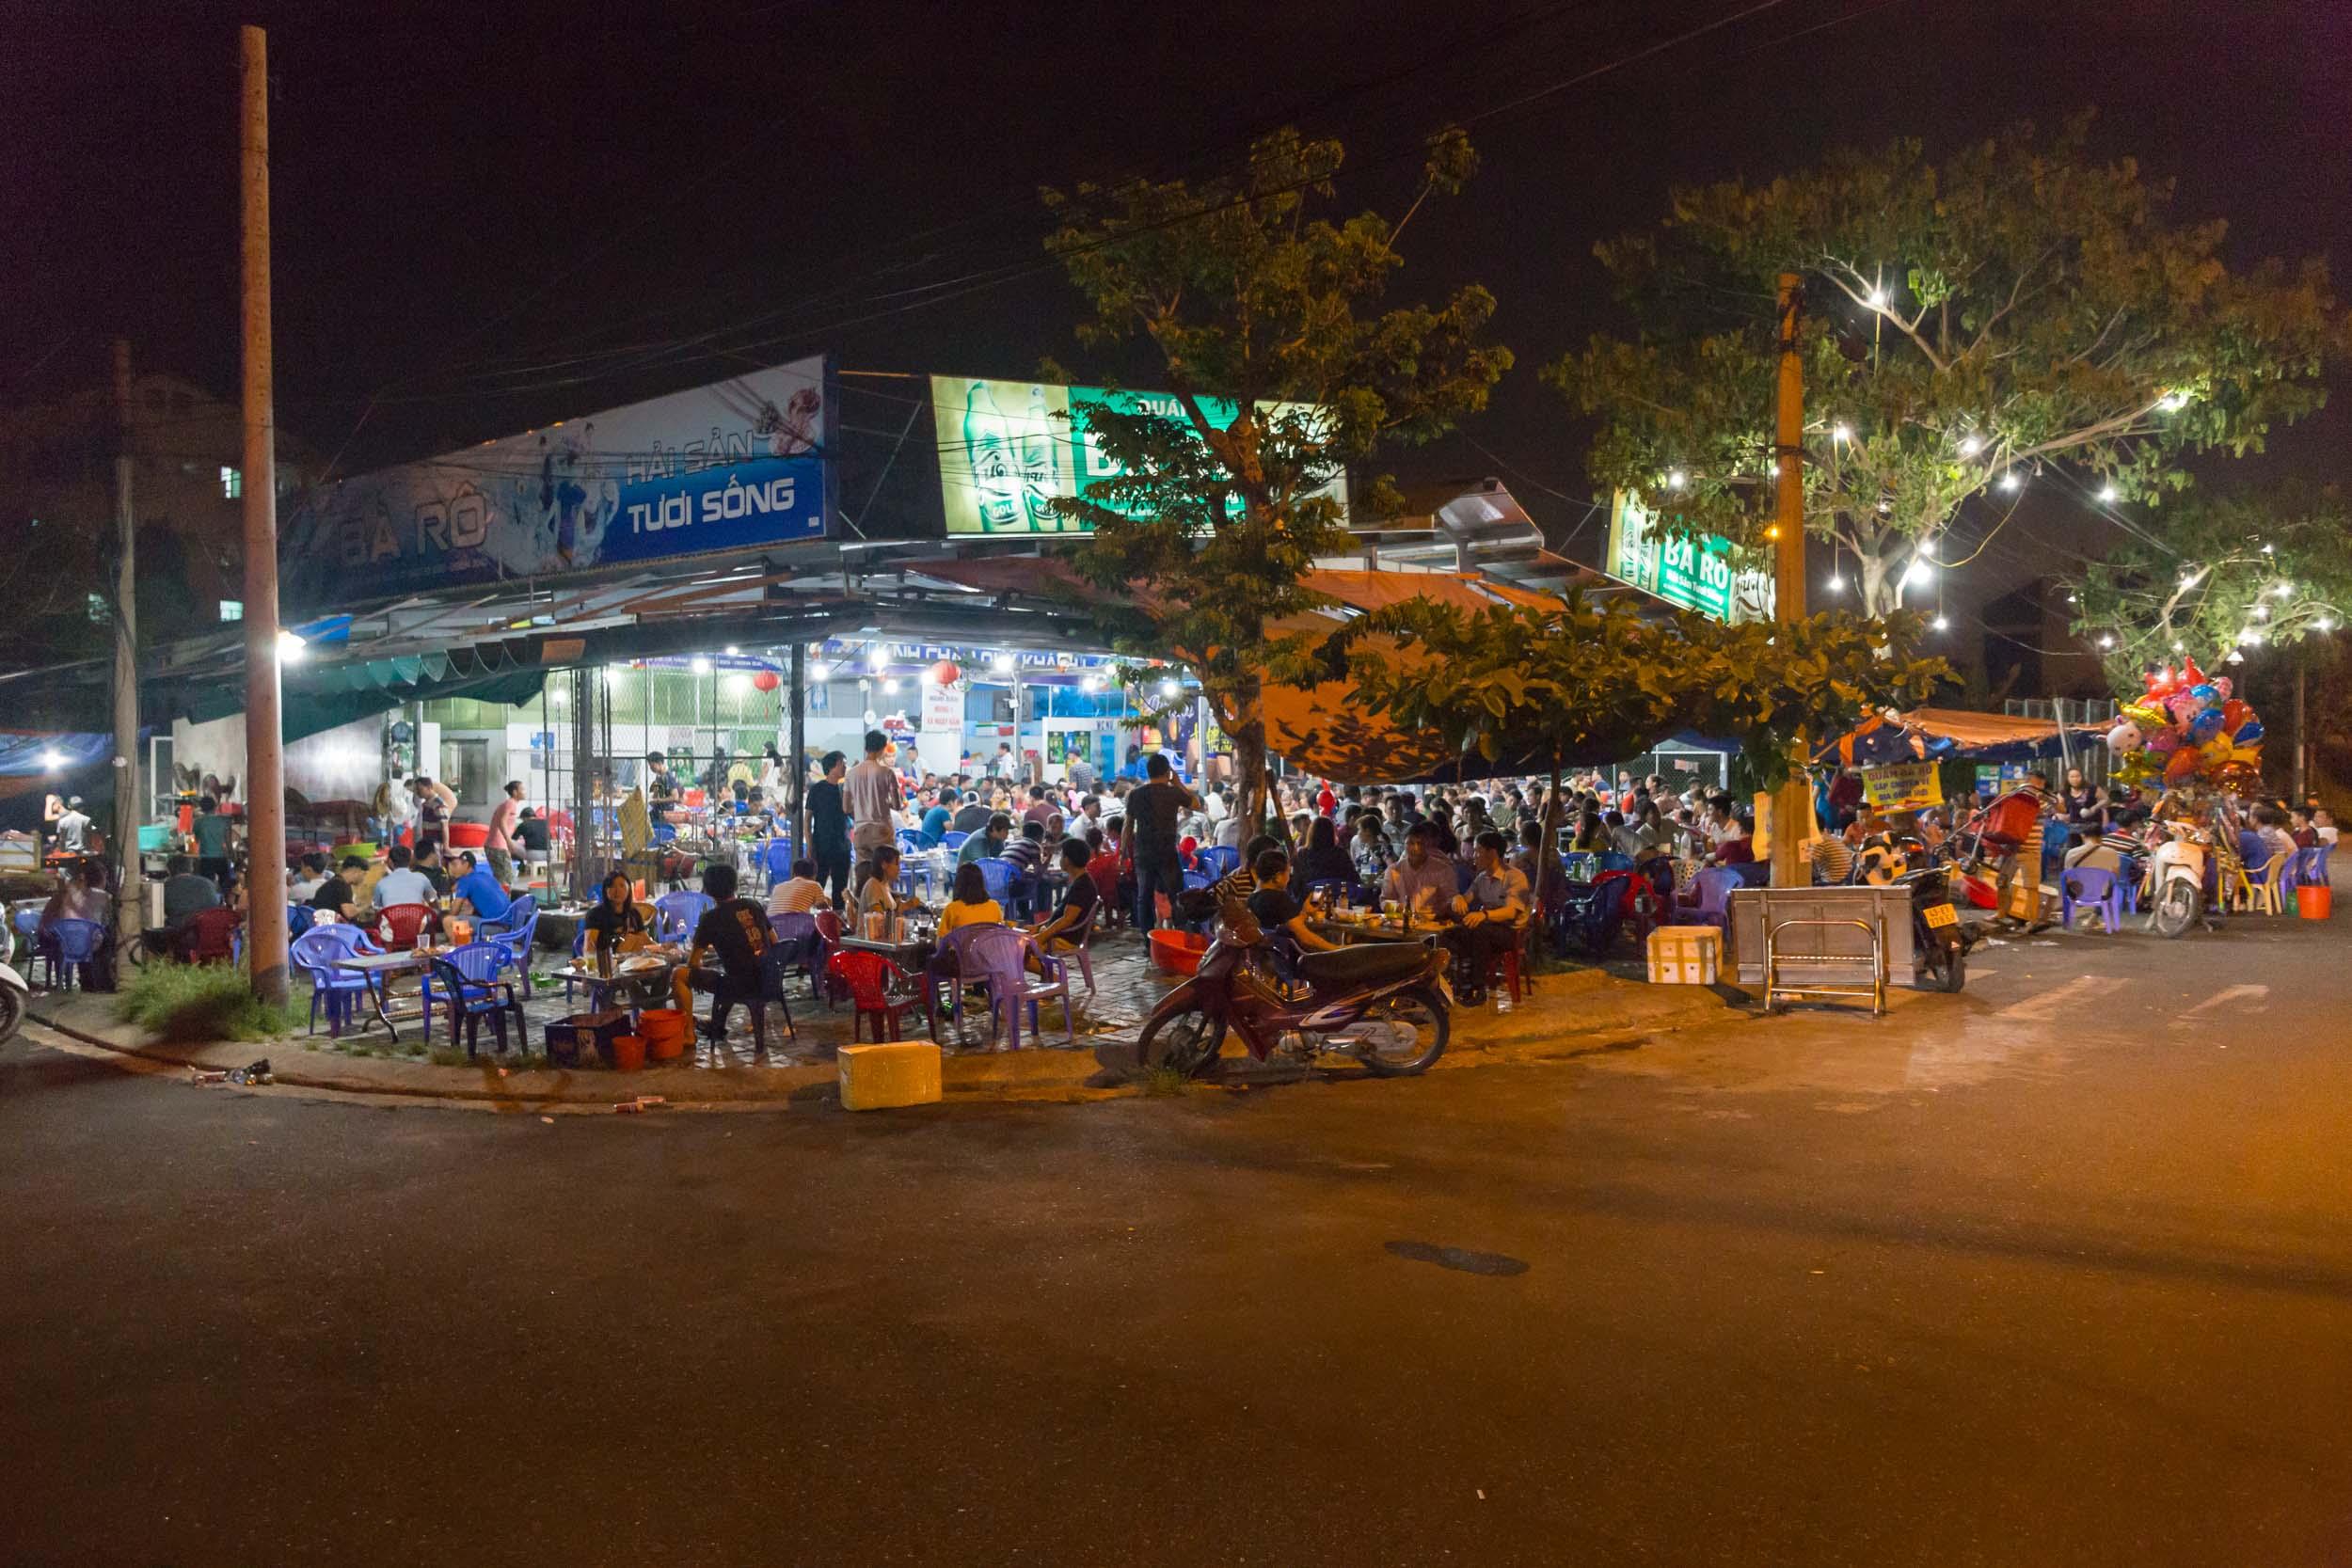 Hải sản Bà Rô, Best Seafood Restaurant Da Nang, Vietnam.